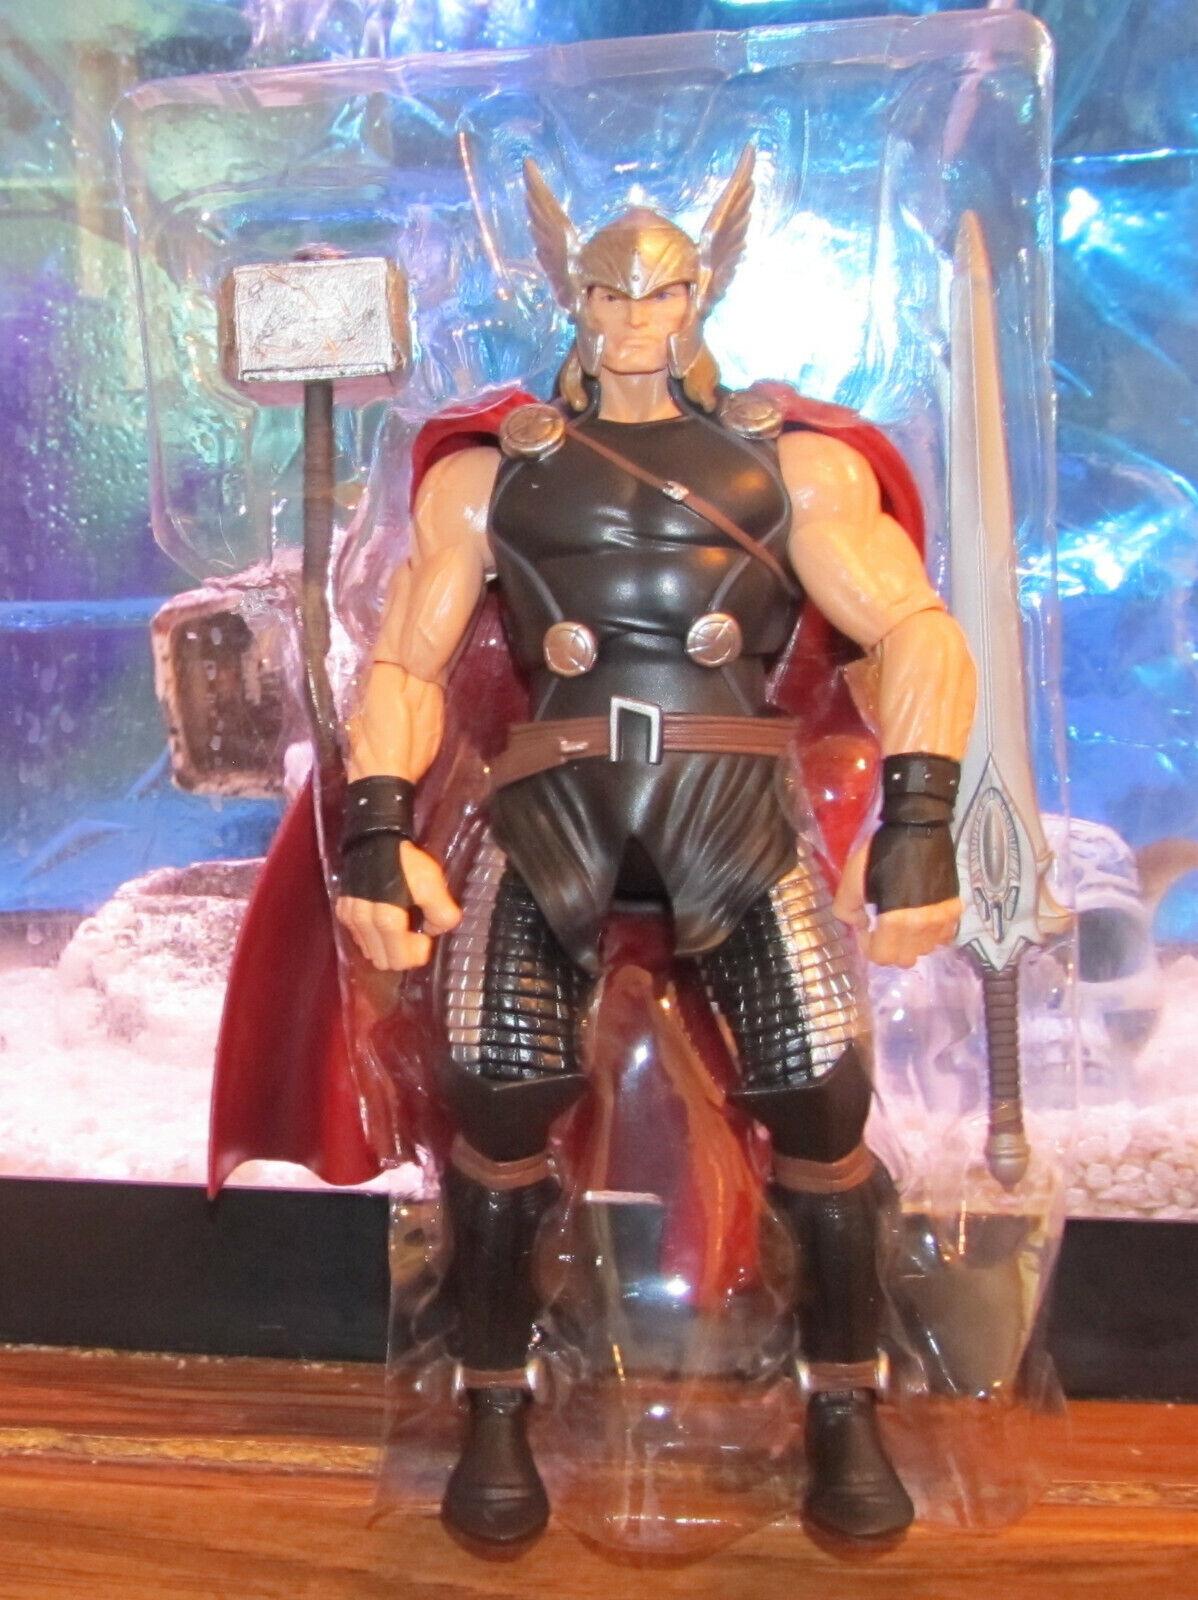 Marvel Legends 2015 MODERN THOR FIGURE Loose 6 Inch Avengers Allfather Wave